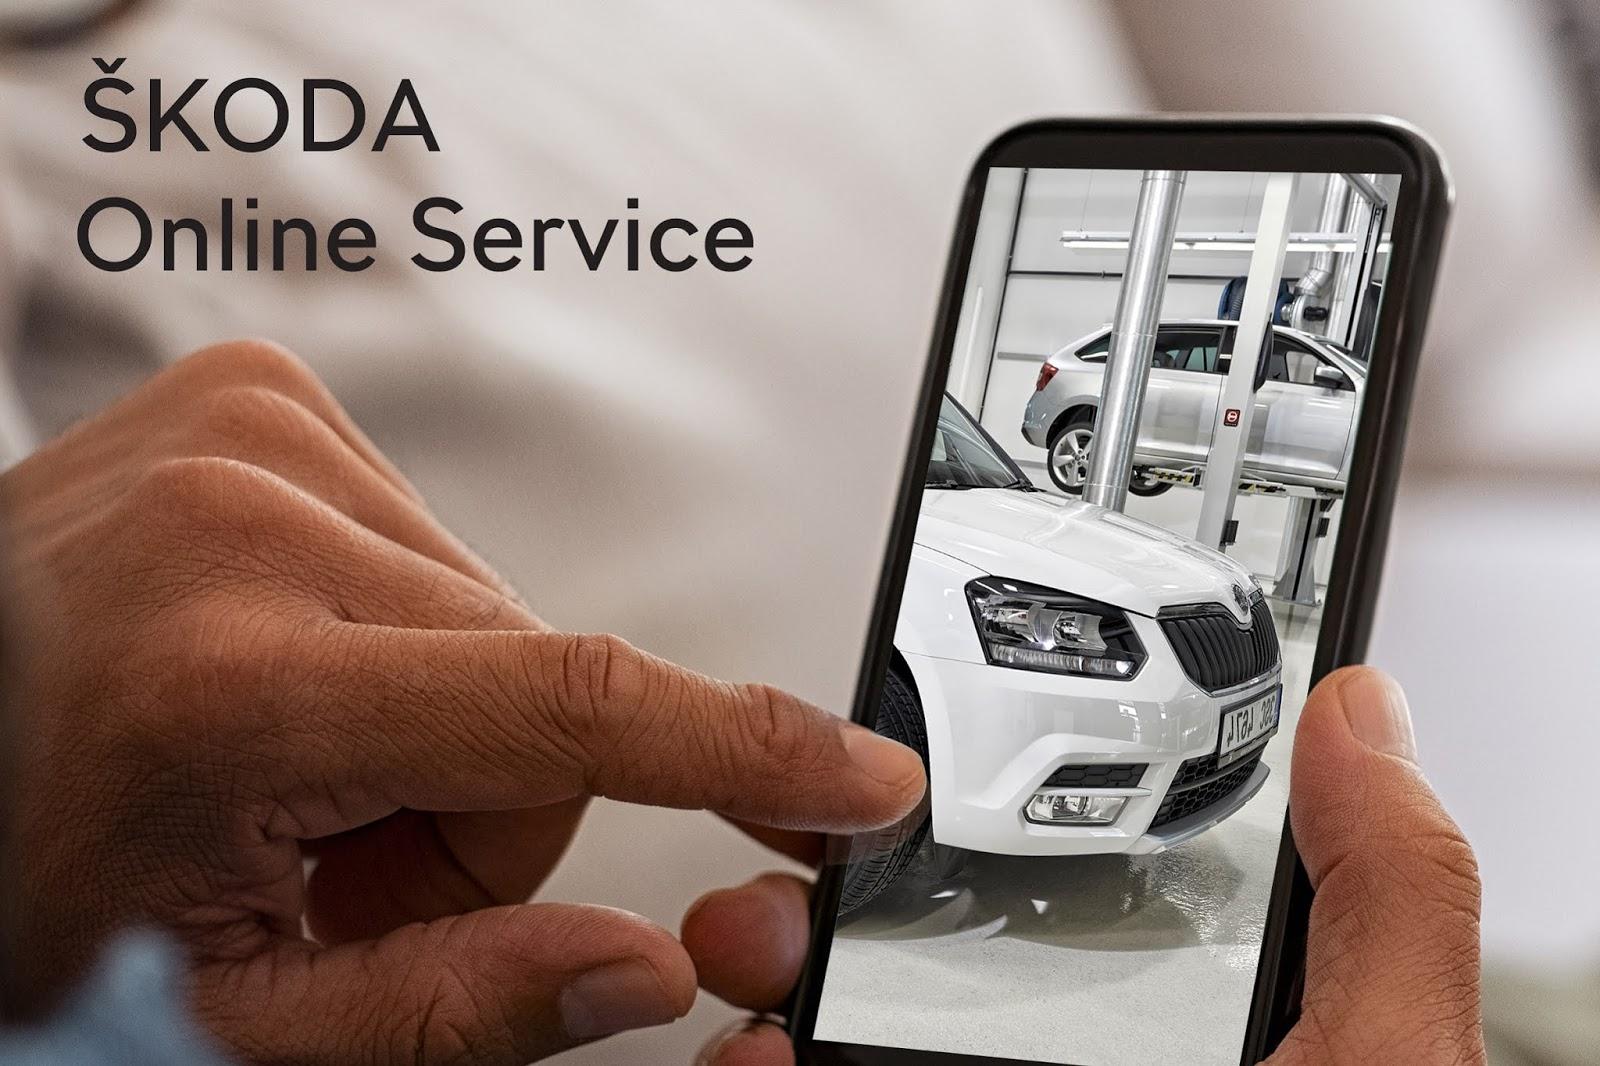 SKODA2BAFTER2BSALES Online2BService Η Kosmocar-Skoda σου στέλνει video από το service! Kosmocar, service, Skoda, αγορά, προσφορές